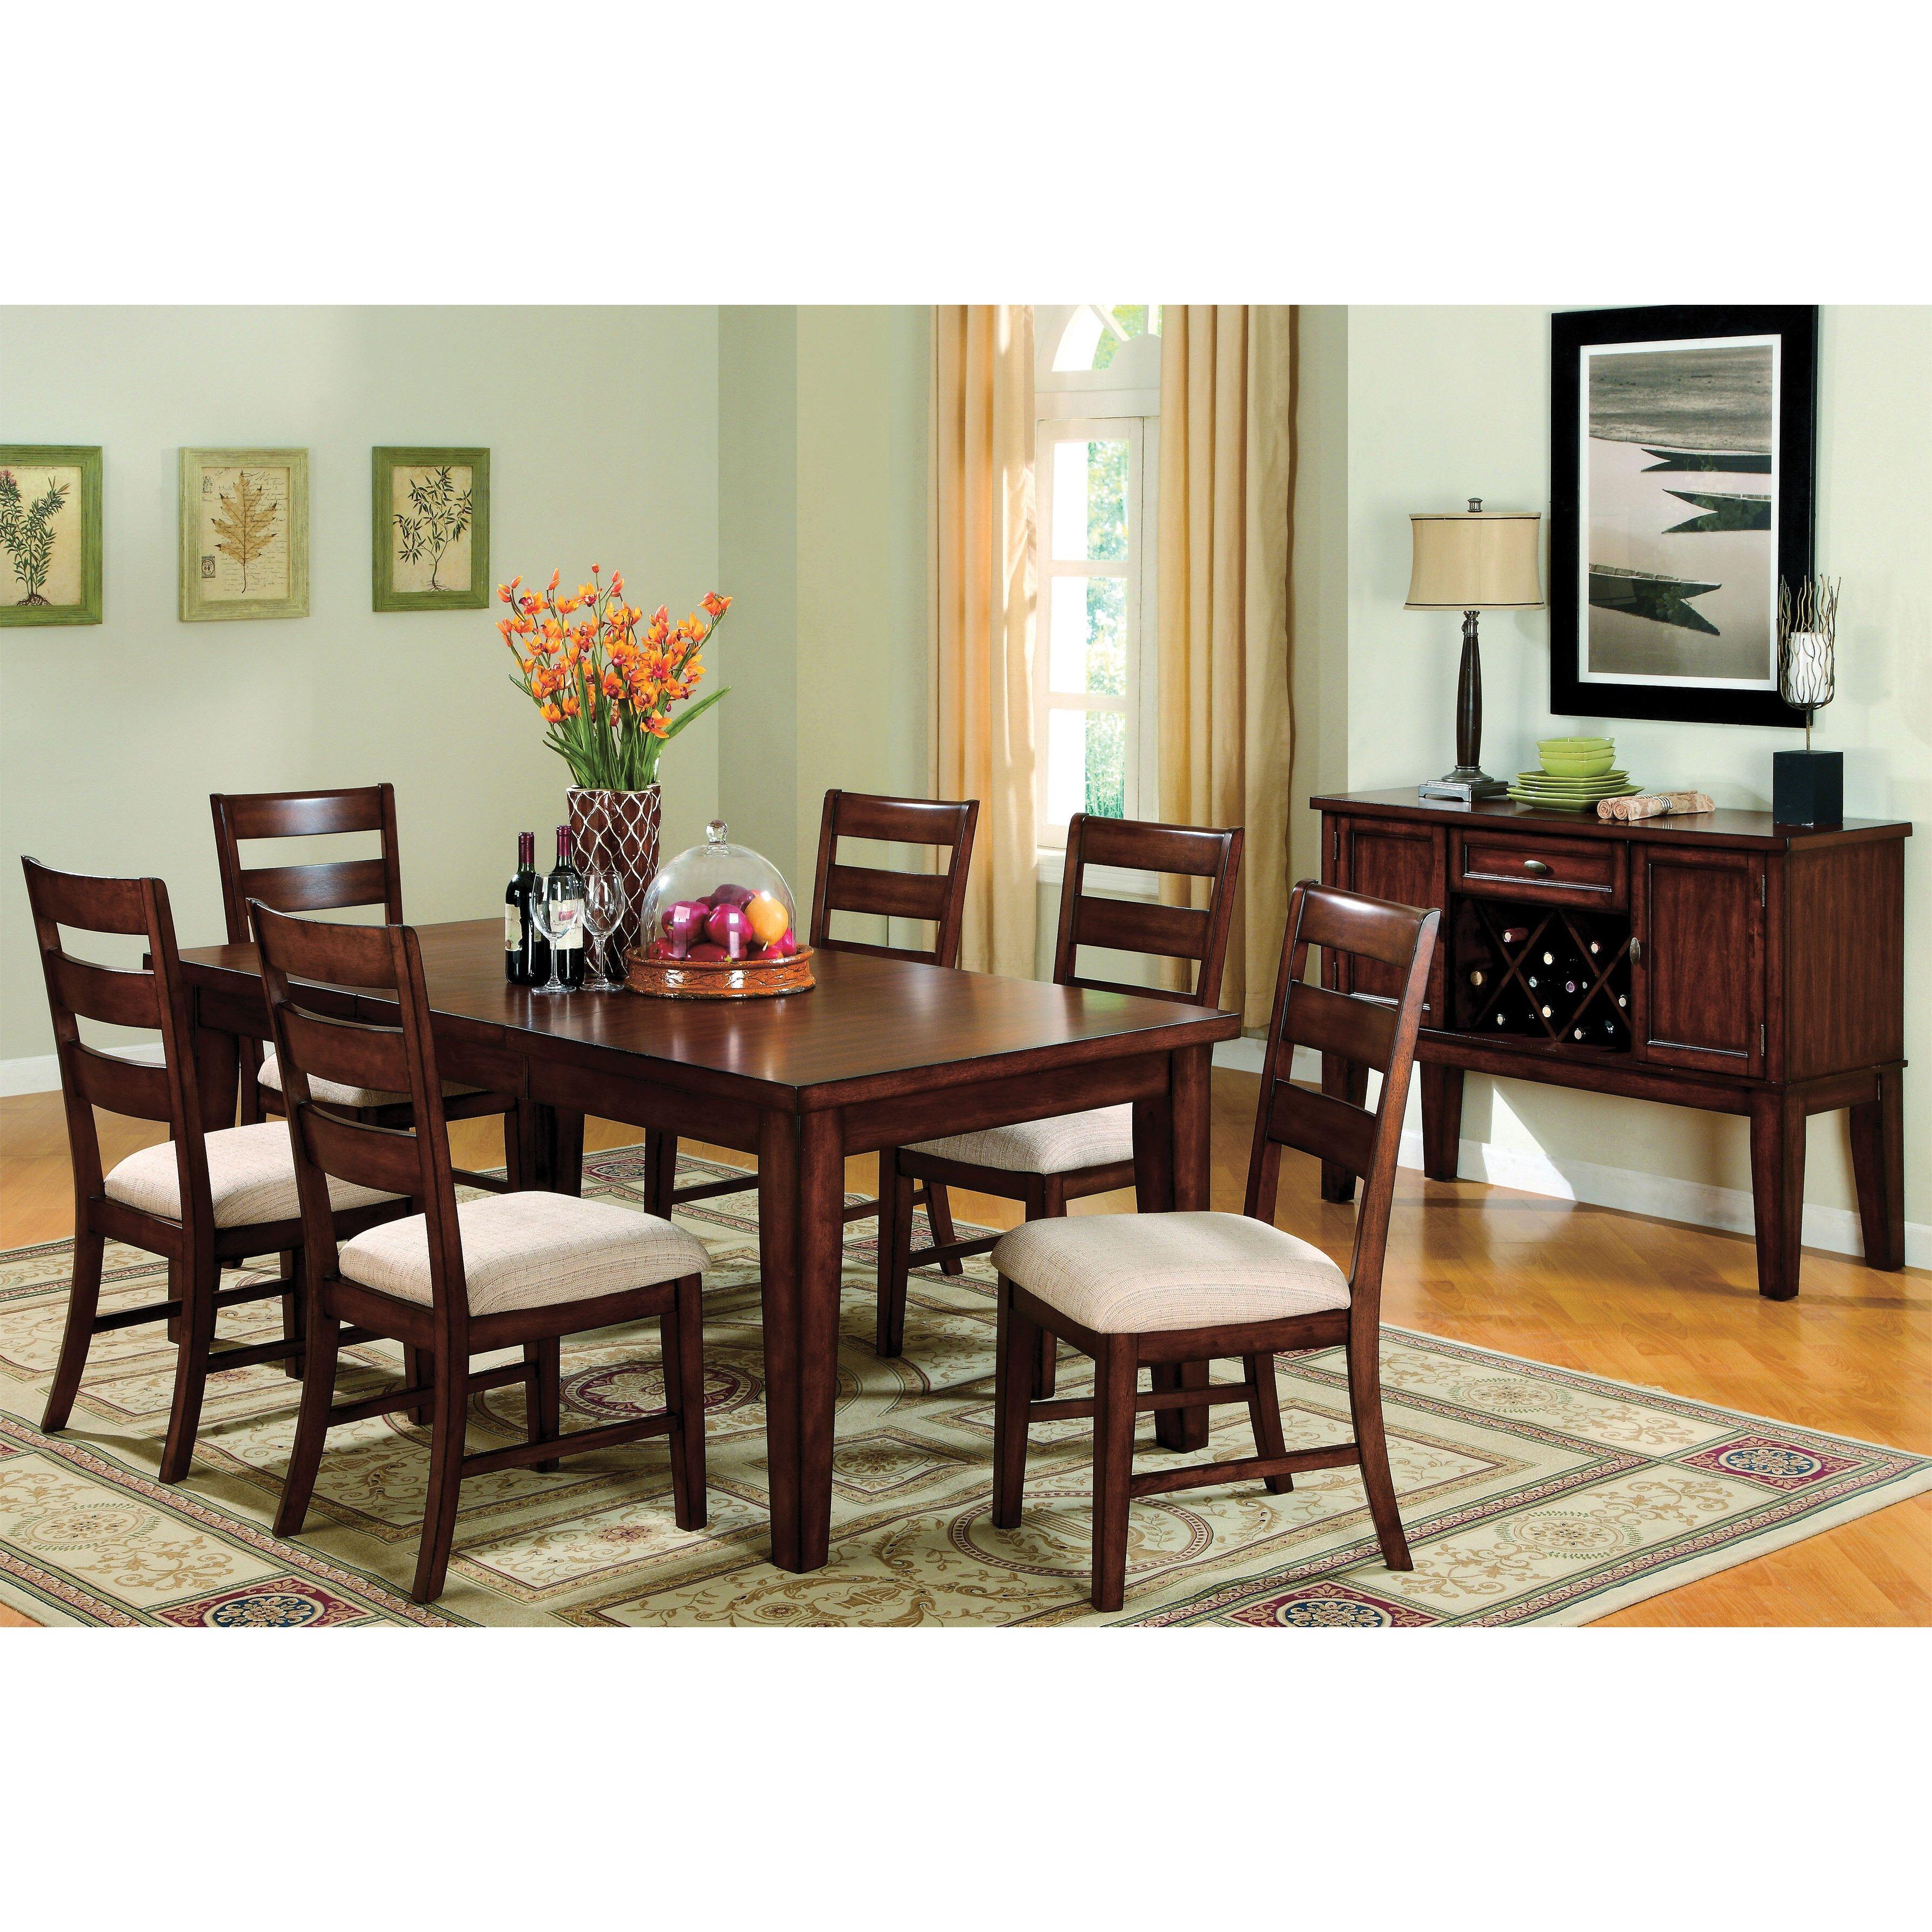 Hokku designs pristine 7 piece dining set reviews wayfair for Furniture 7 credit reviews